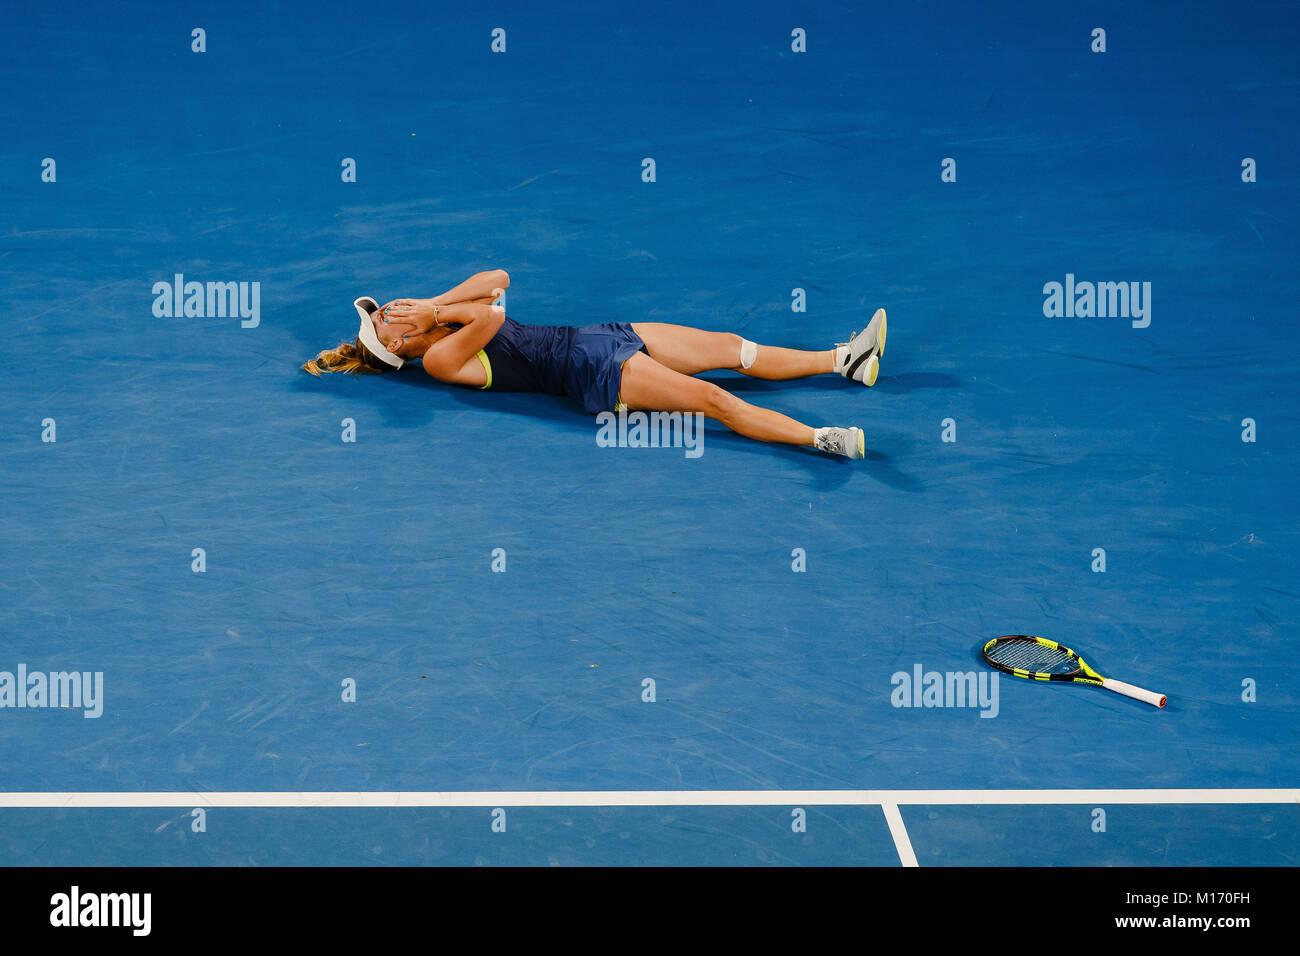 Melbourne, Australia , 27th January 2018: Danish tennis player Caroline Wozniacki won her first Grand Slam title - Stock Image